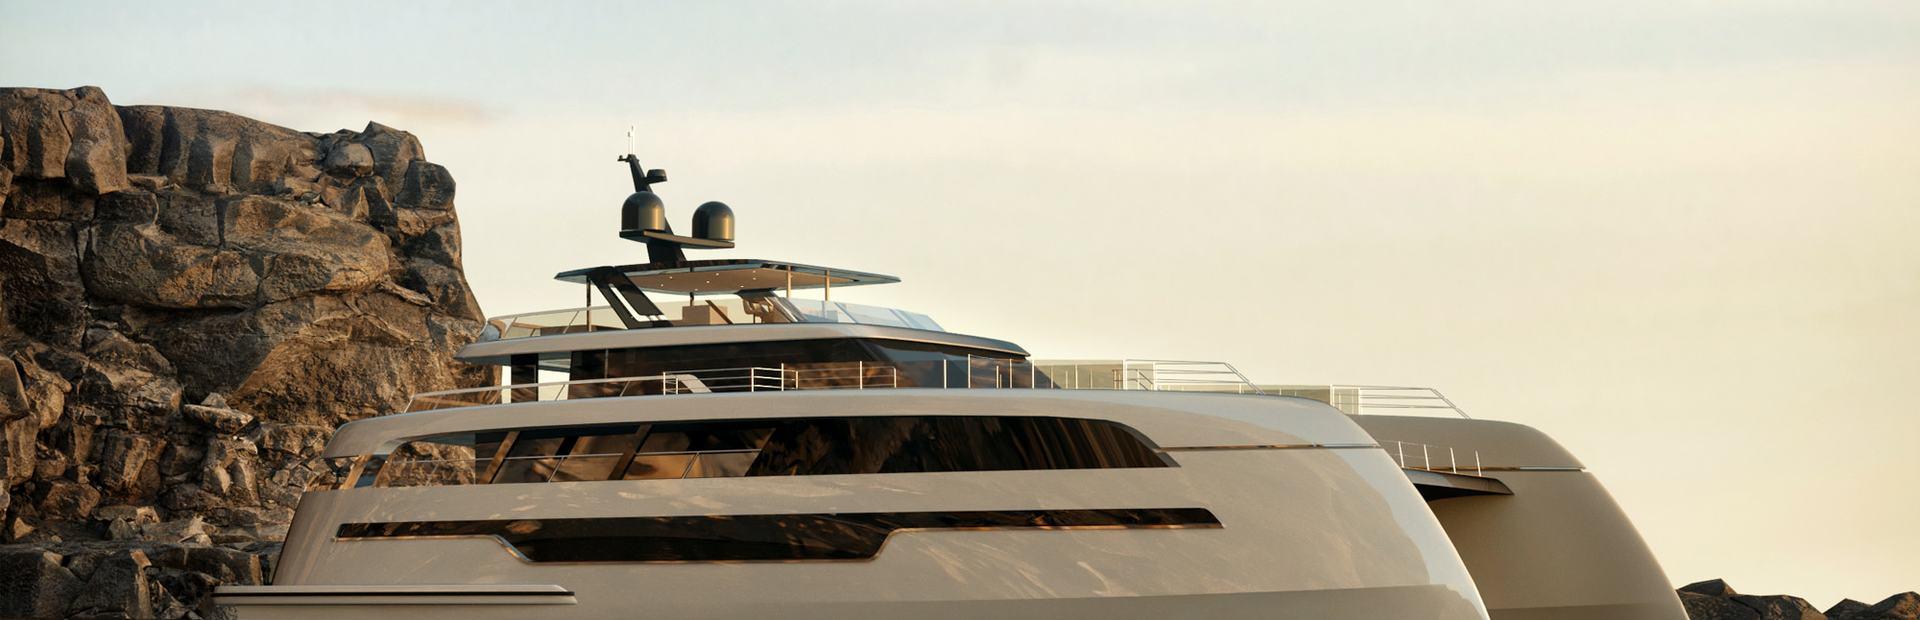 110 Sunreef Power Yacht Charter